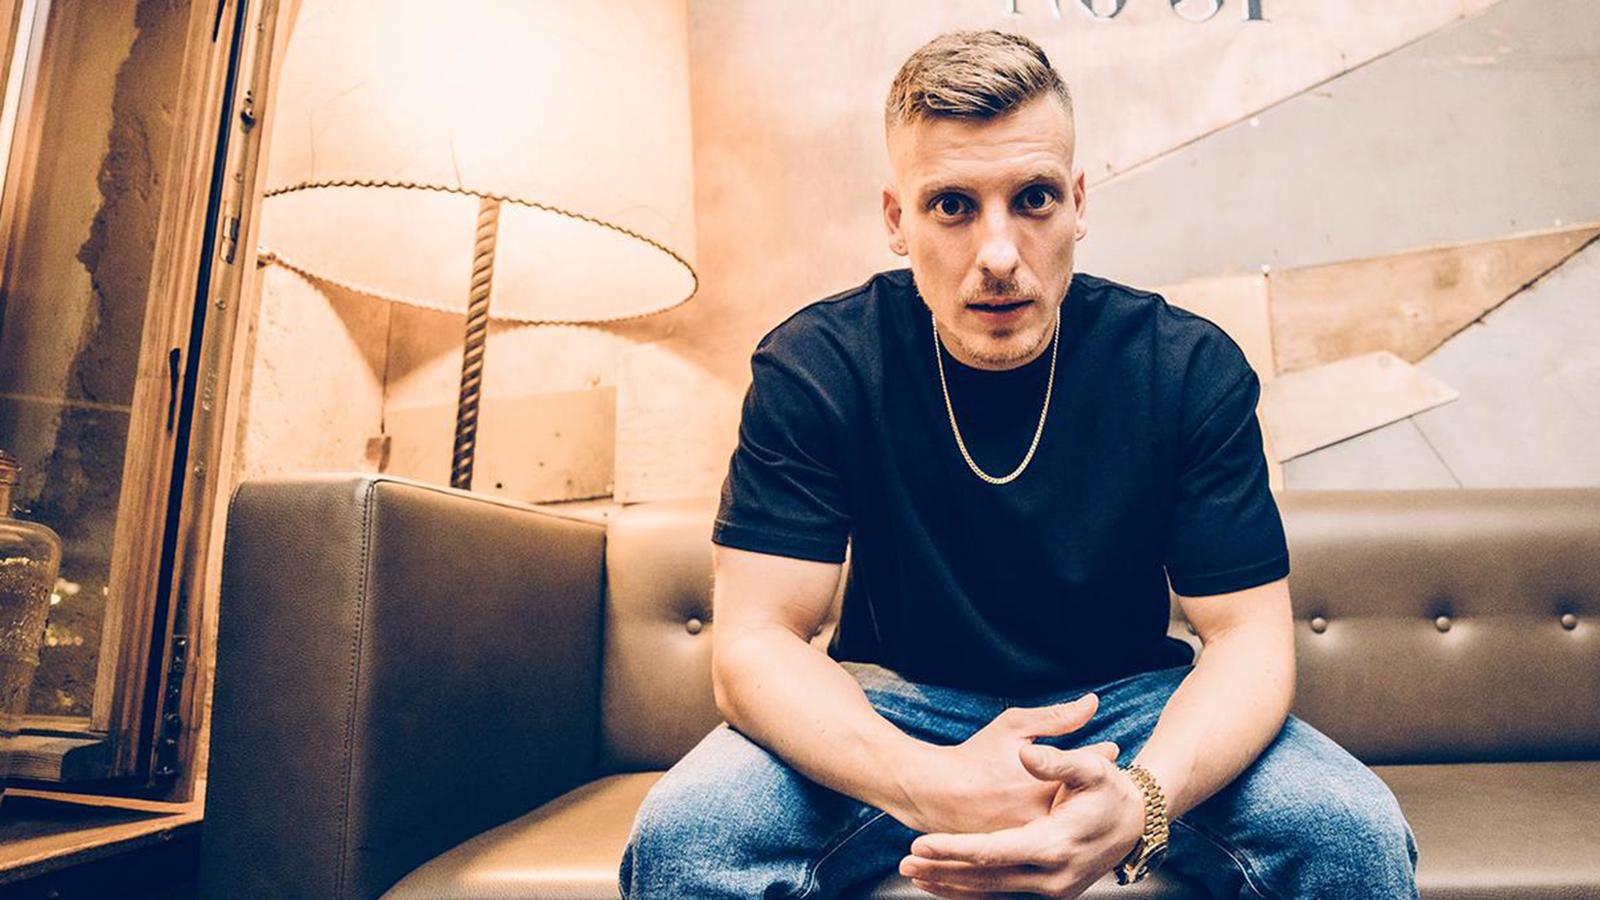 FELIX LOBRECHT über Capital Bra, Xatar, Drake, Newcomer & Hype – Release Friday powered by Teufel